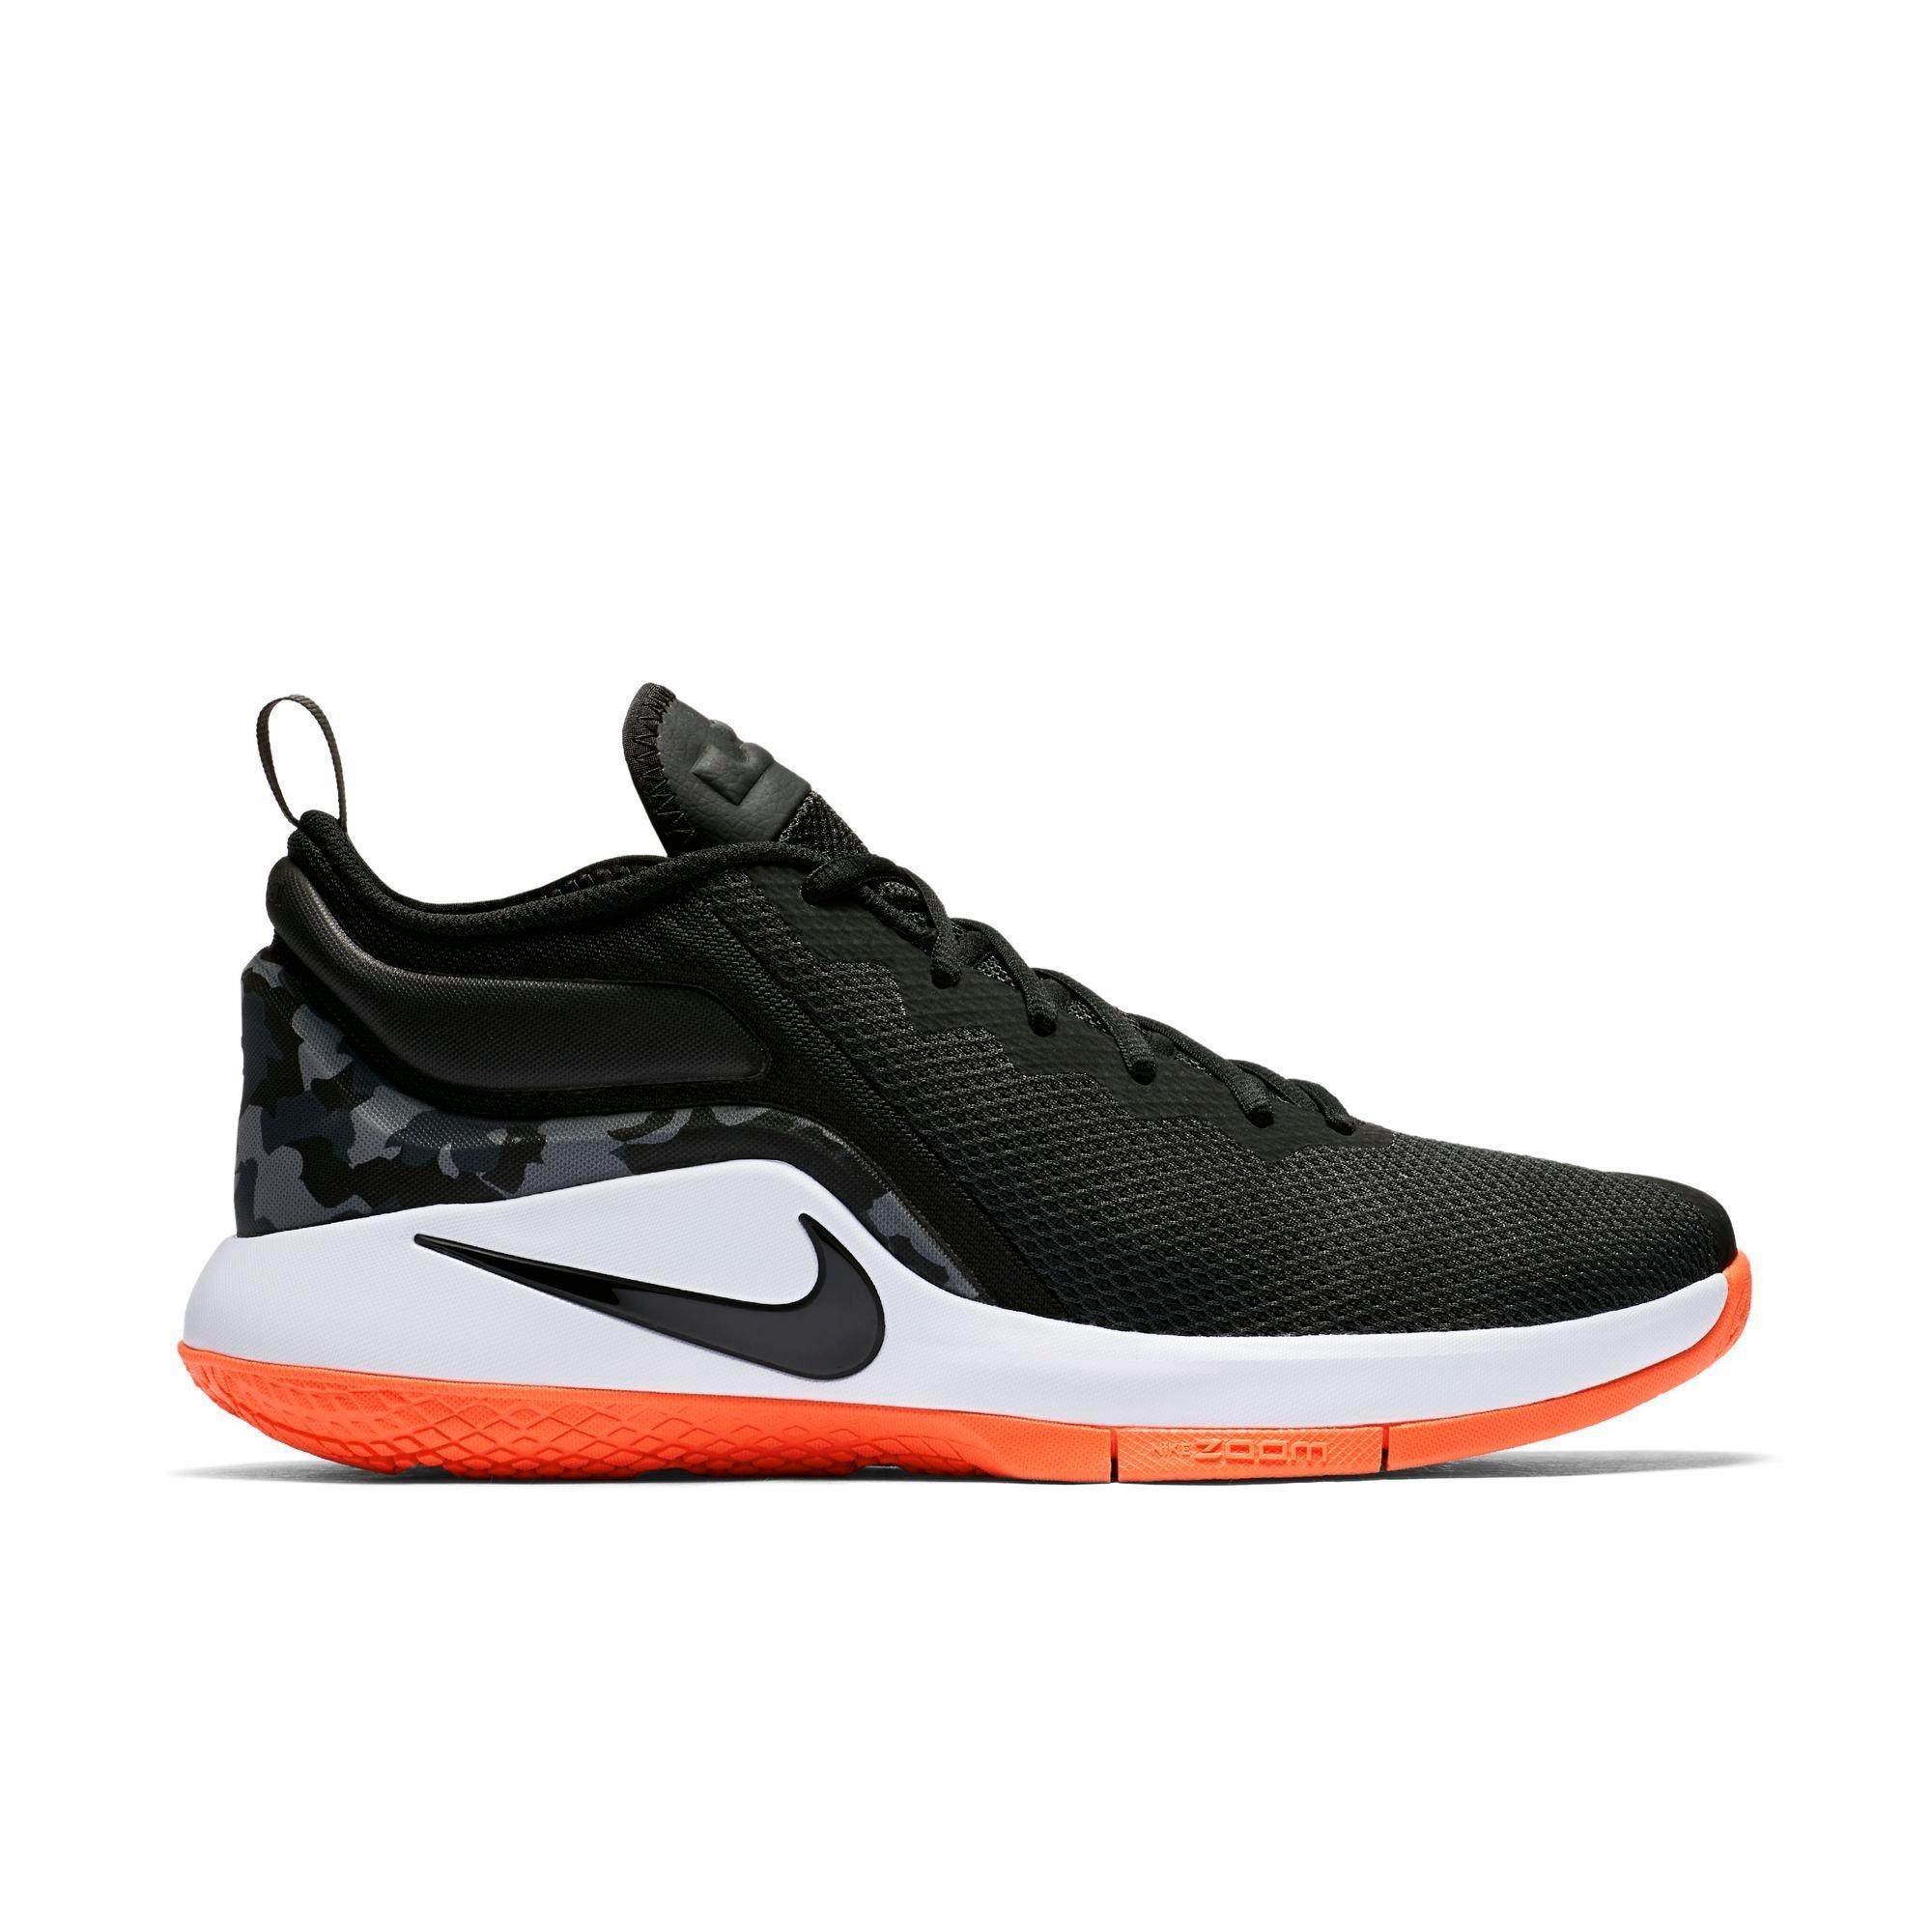 Nike Youth Basketball Shoes Clearance